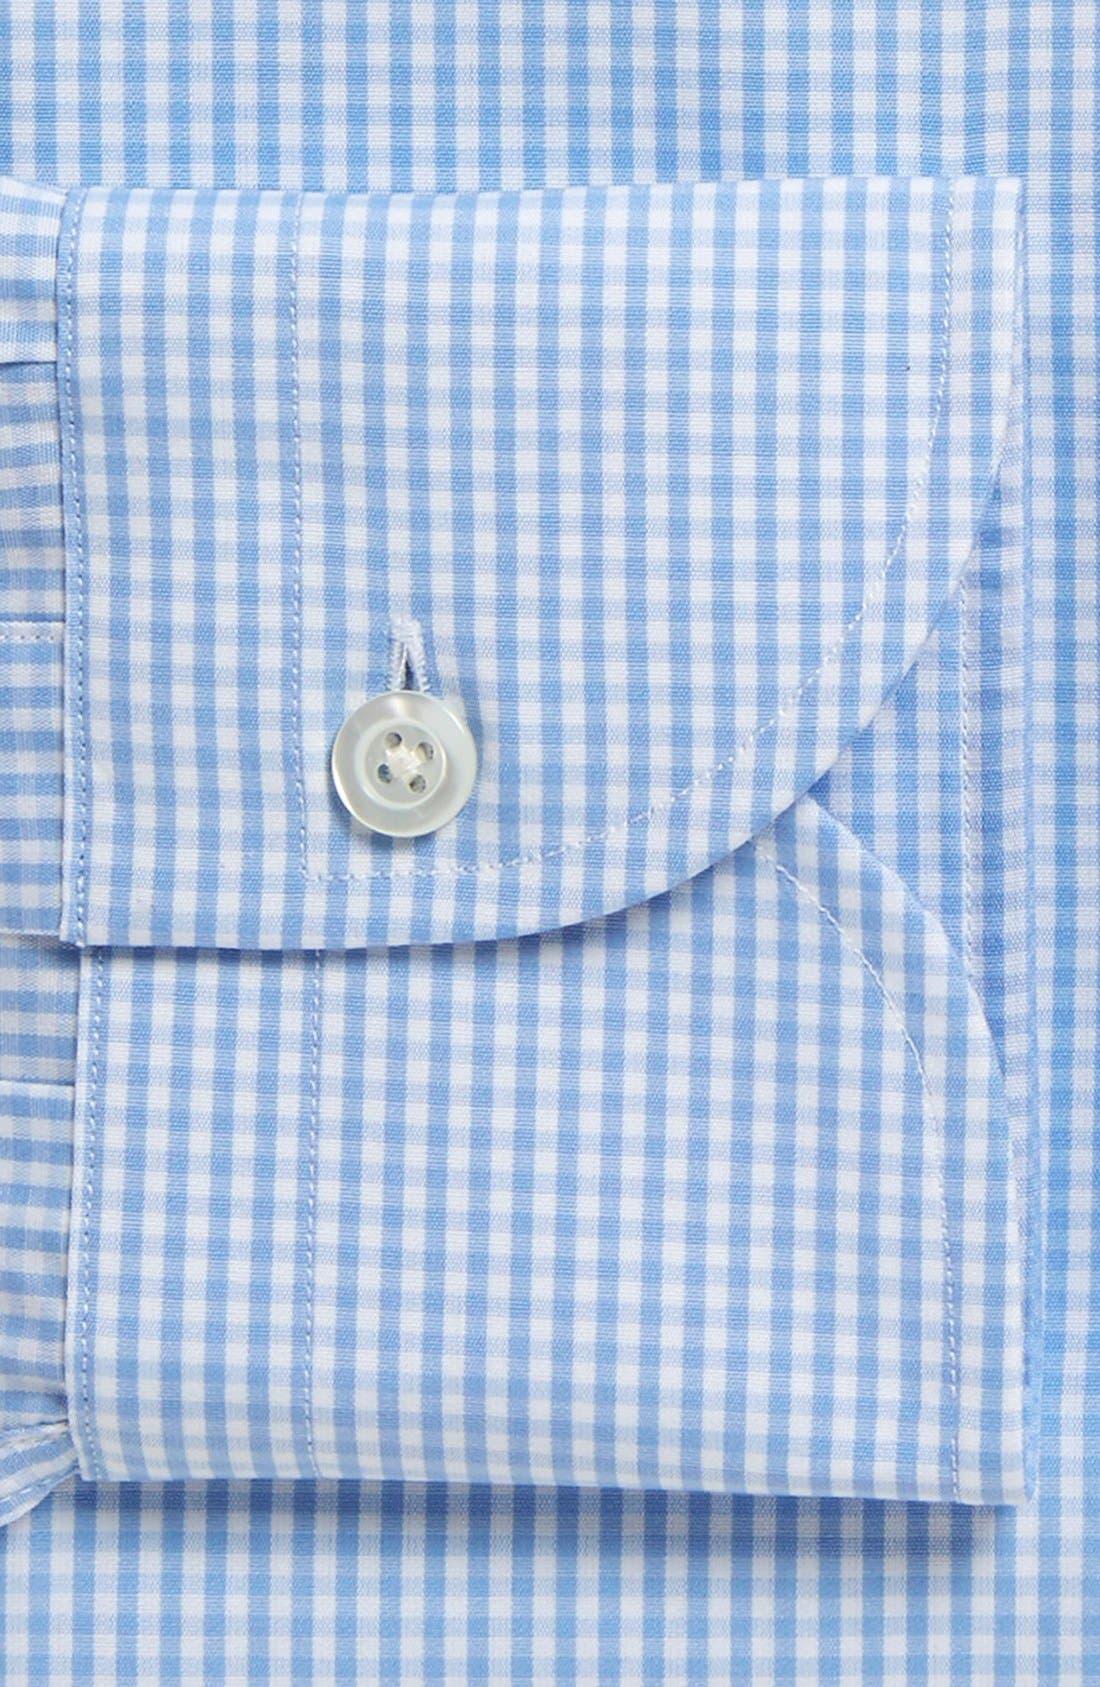 'Blue Gingham' Slim Fit Check Dress Shirt,                             Alternate thumbnail 4, color,